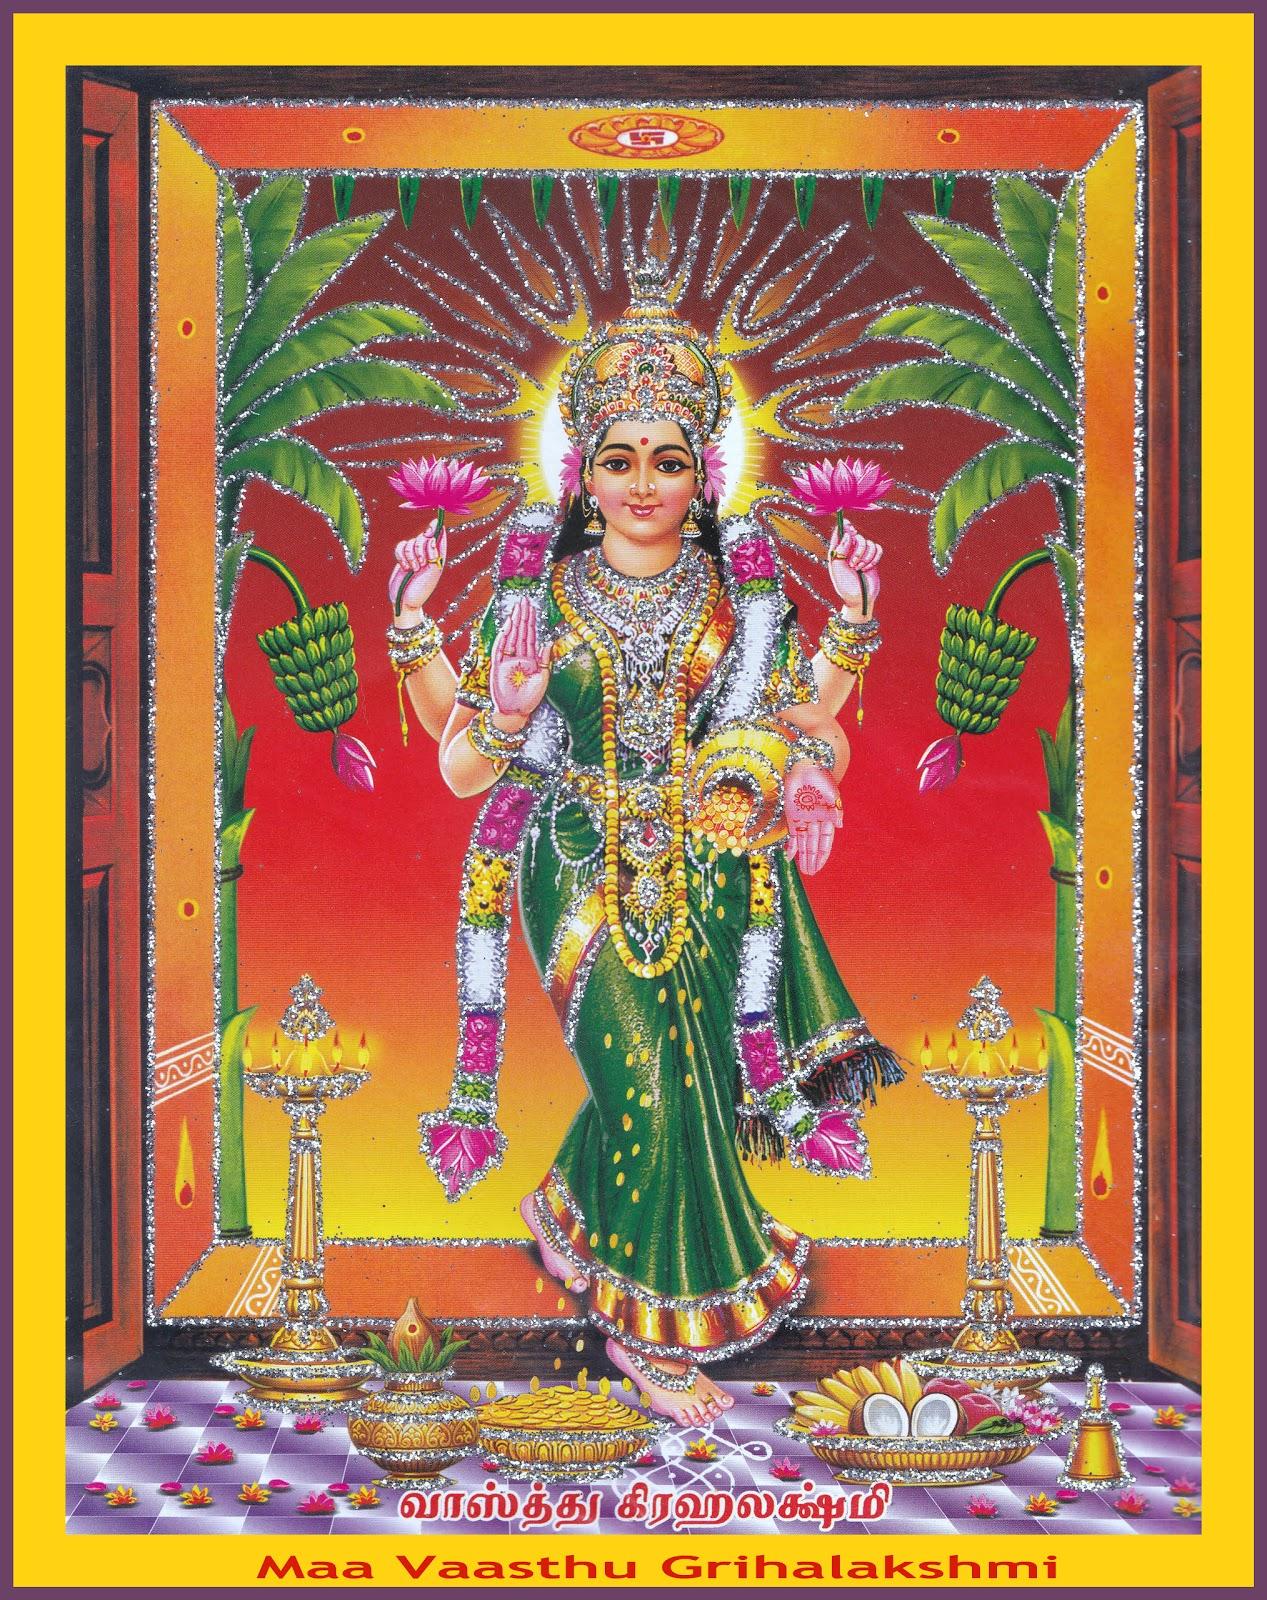 Vaasthu http://www.trinethram-divine.com/2012/07/vaasthu-grihalakshmi ...